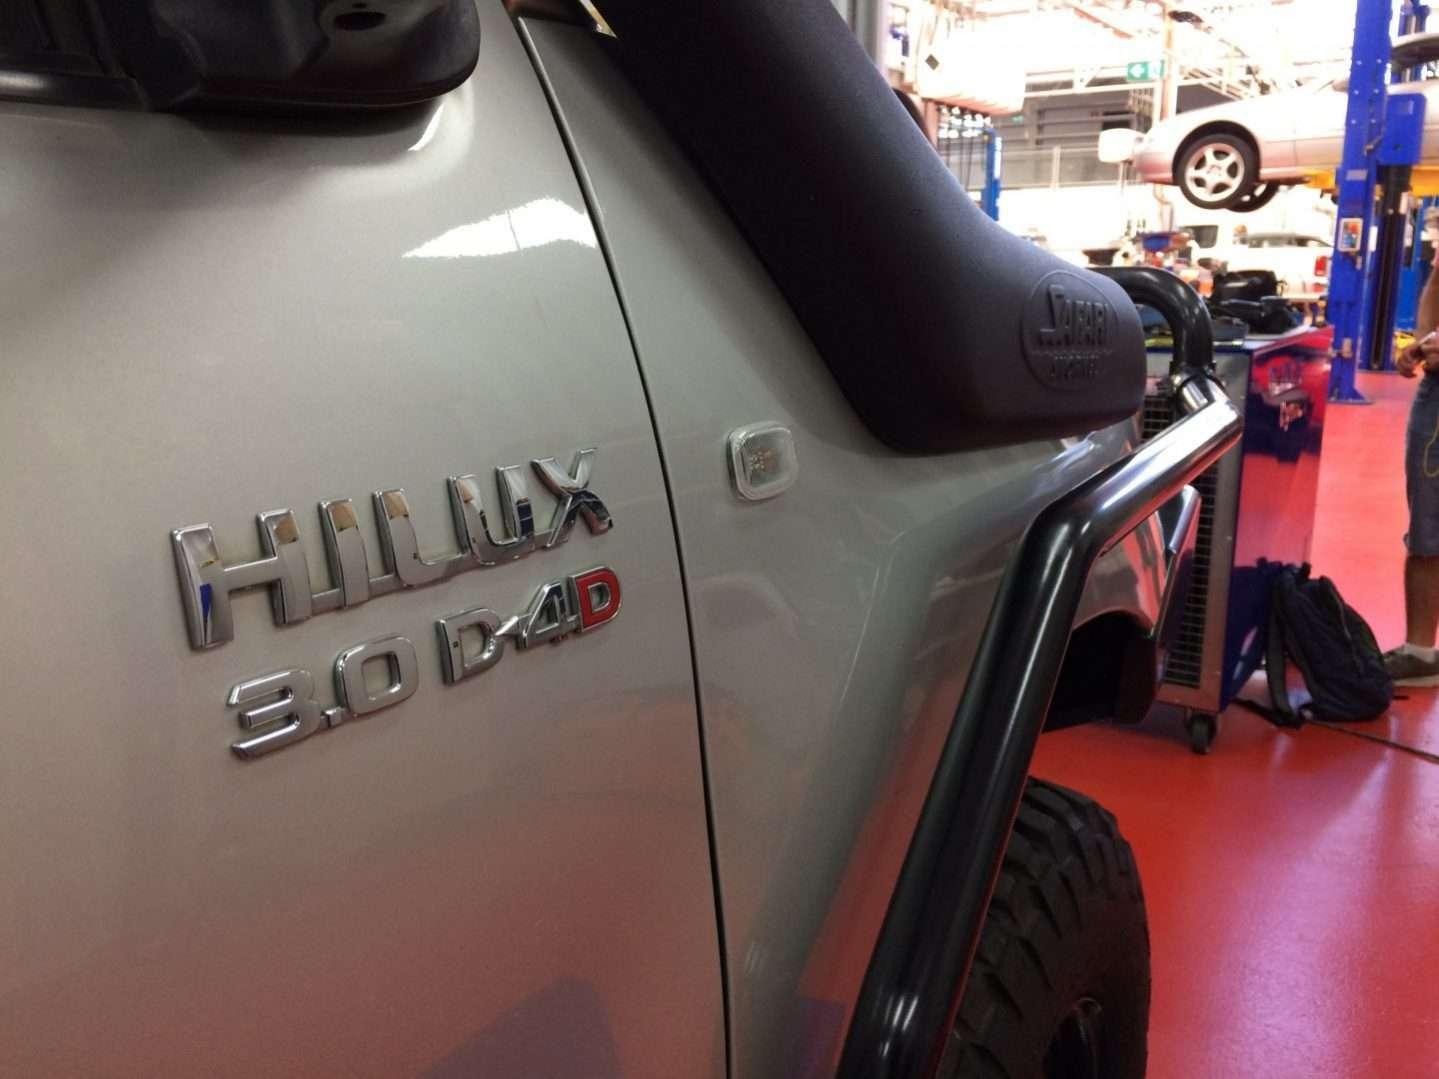 Toyota Hilux 3 0 D4D 3 0L 120 kW ECU REMAP - Diesel tuning specialist